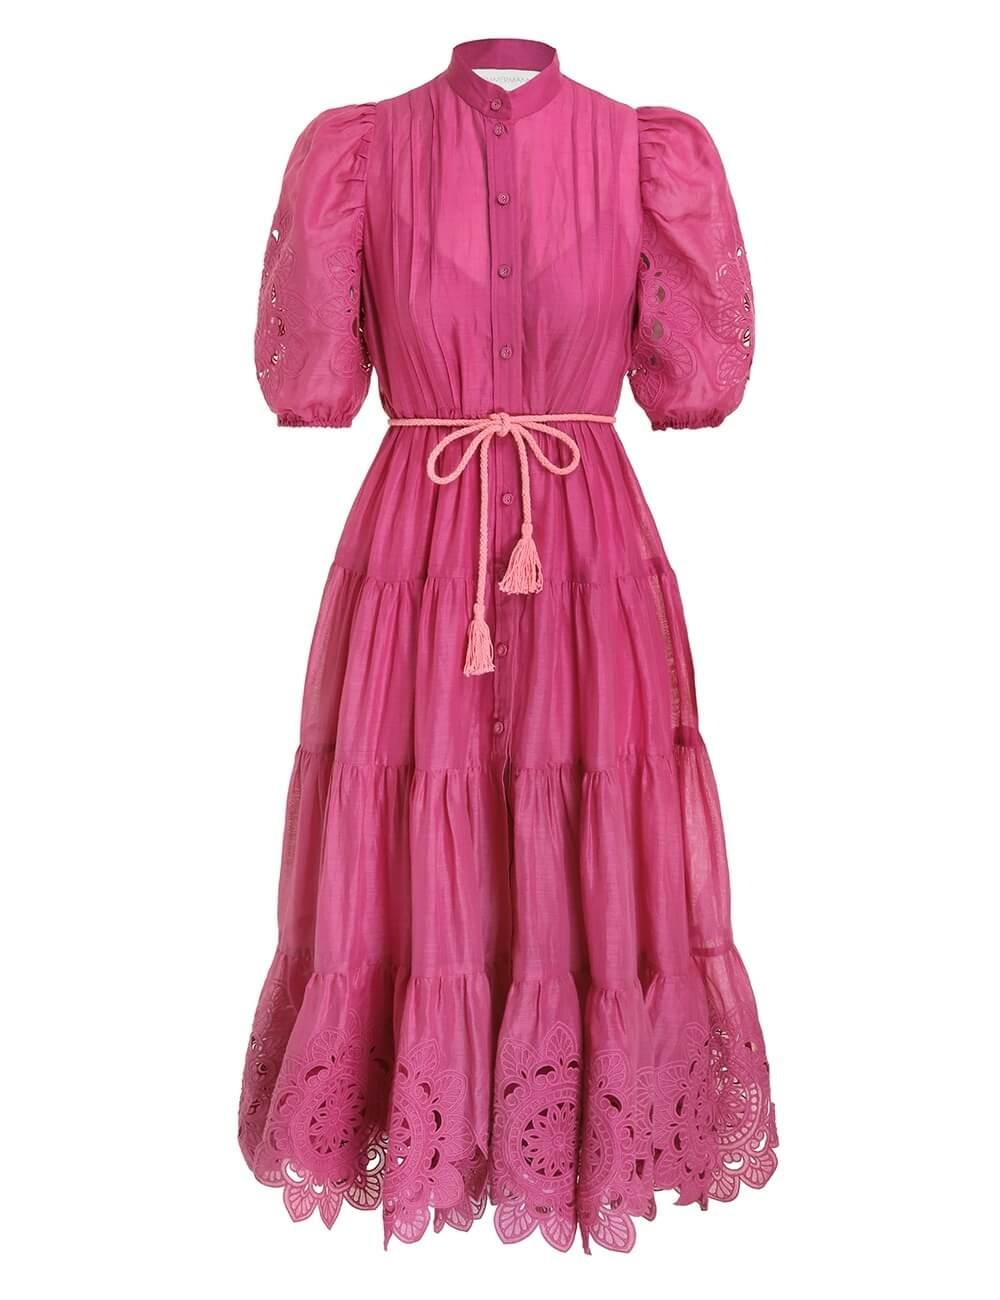 Teddy Scallop Frill Midi Dress Item # 1709DTED